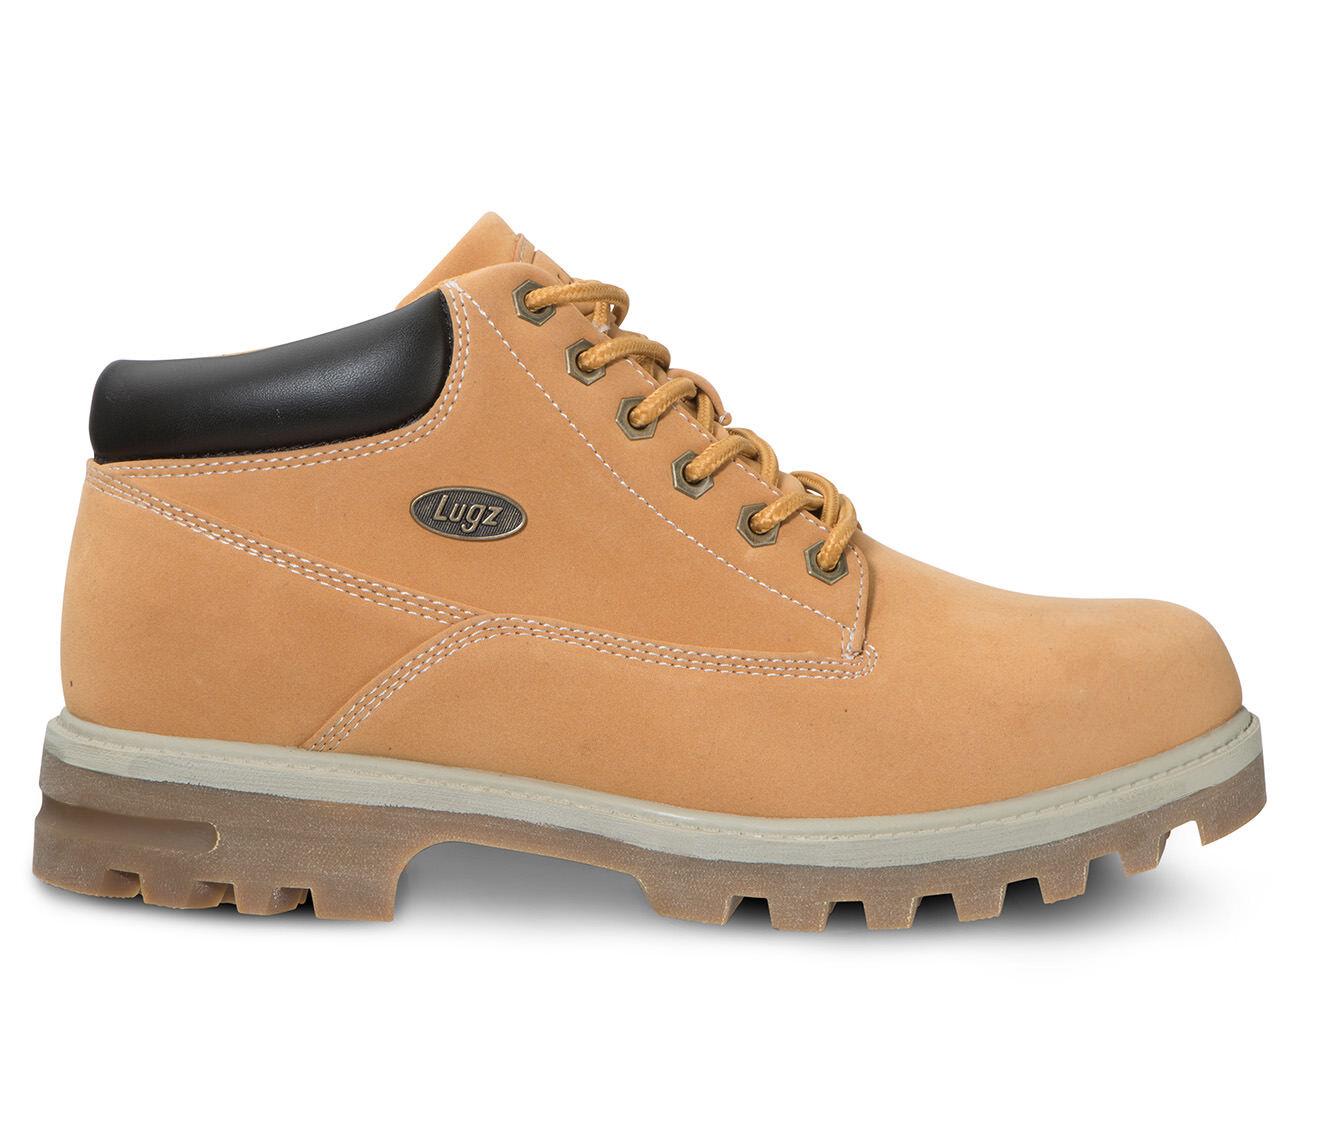 Men's Lugz Empire Water Resistant Boots Wheat/Cream/Gum